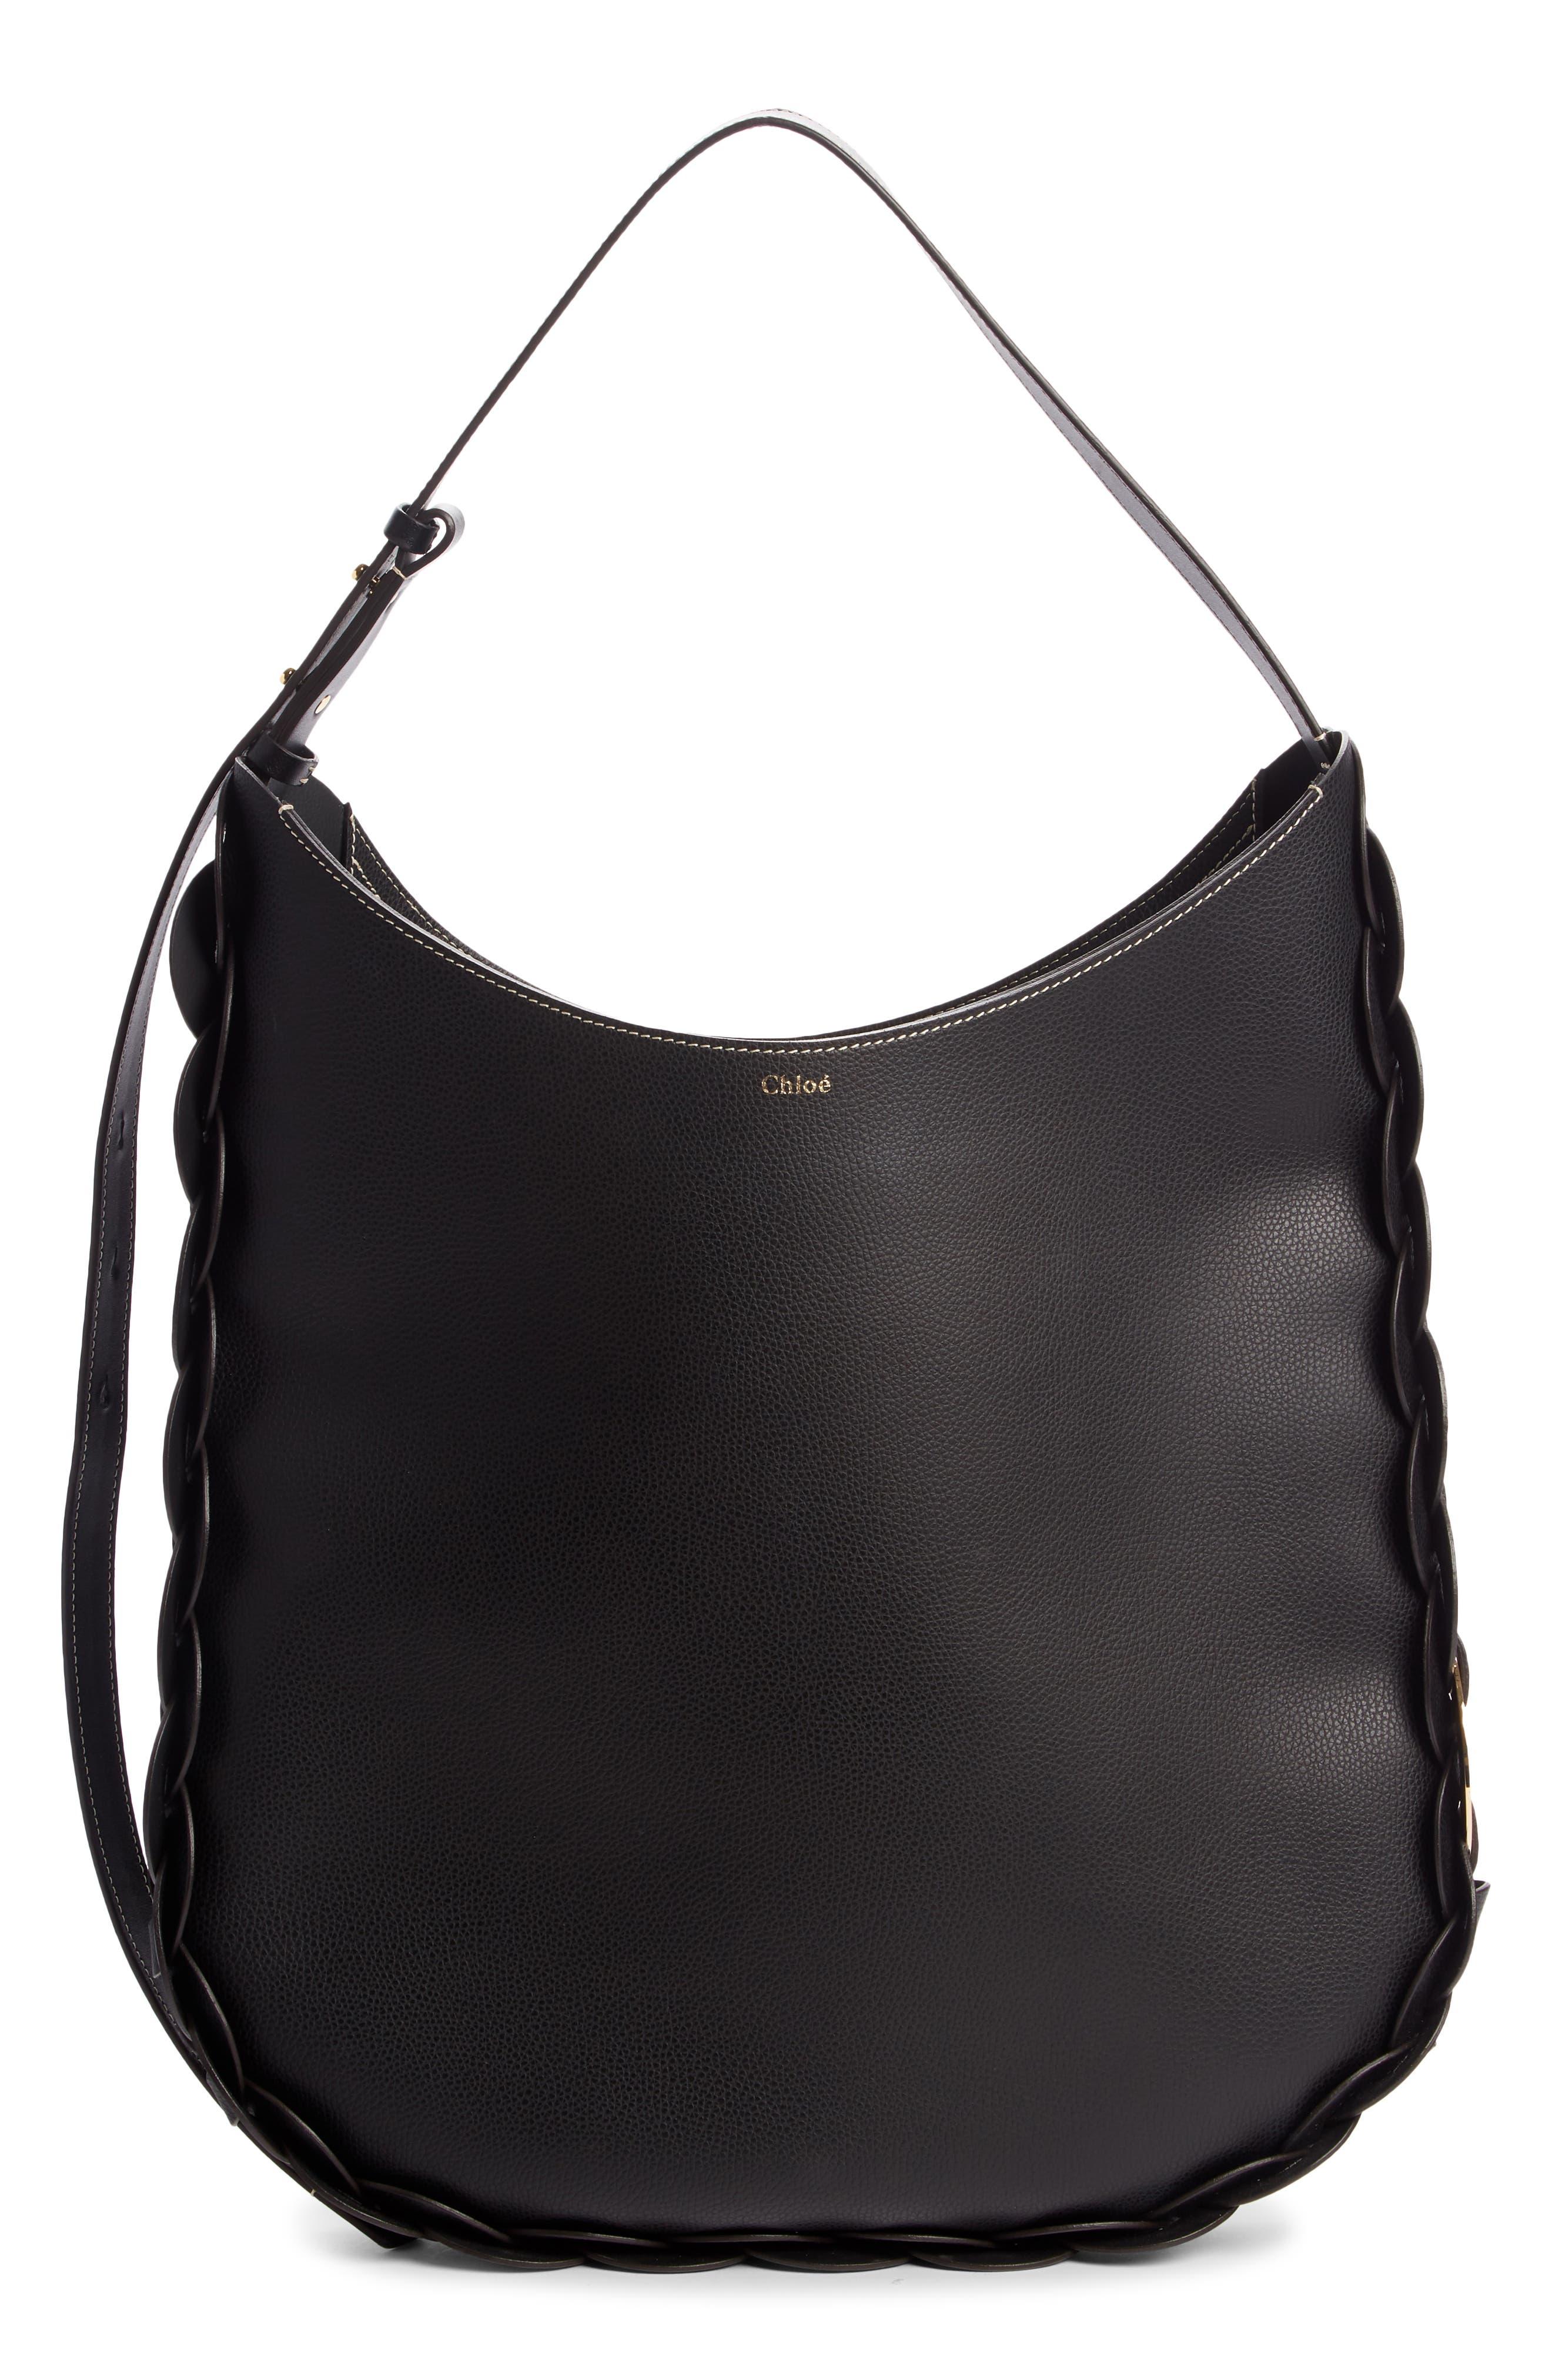 Chloe Large Darryl Leather Hobo - Black